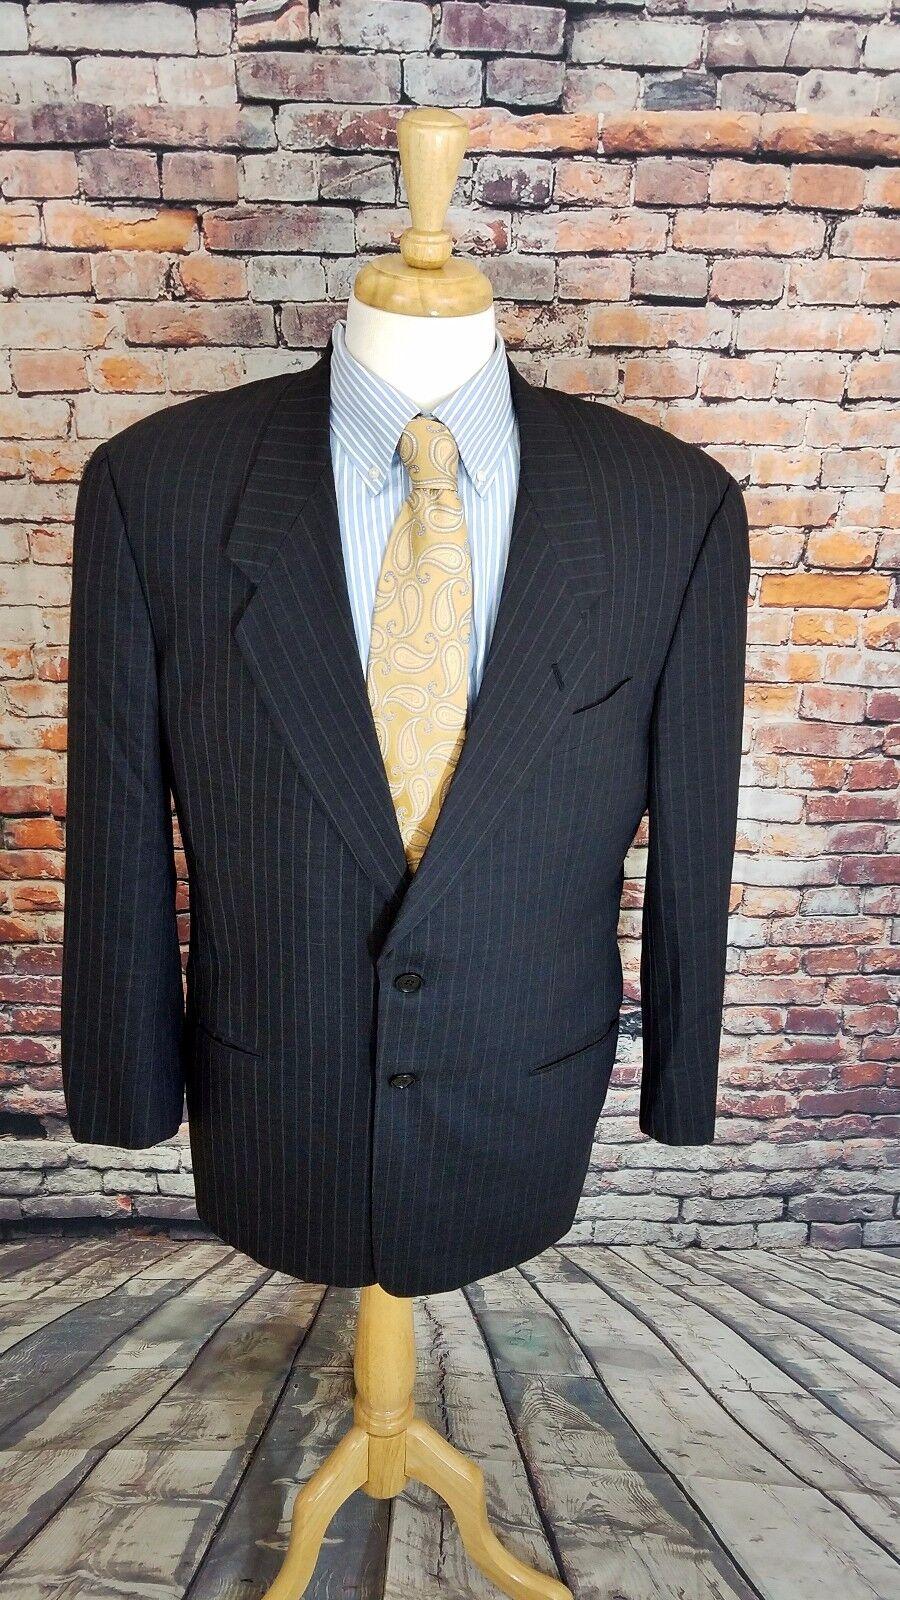 Armani COLLEZIONI ITALY 41R  WOOL 2 BTN Charcoal Grey Stripe Blazer Sport Coat